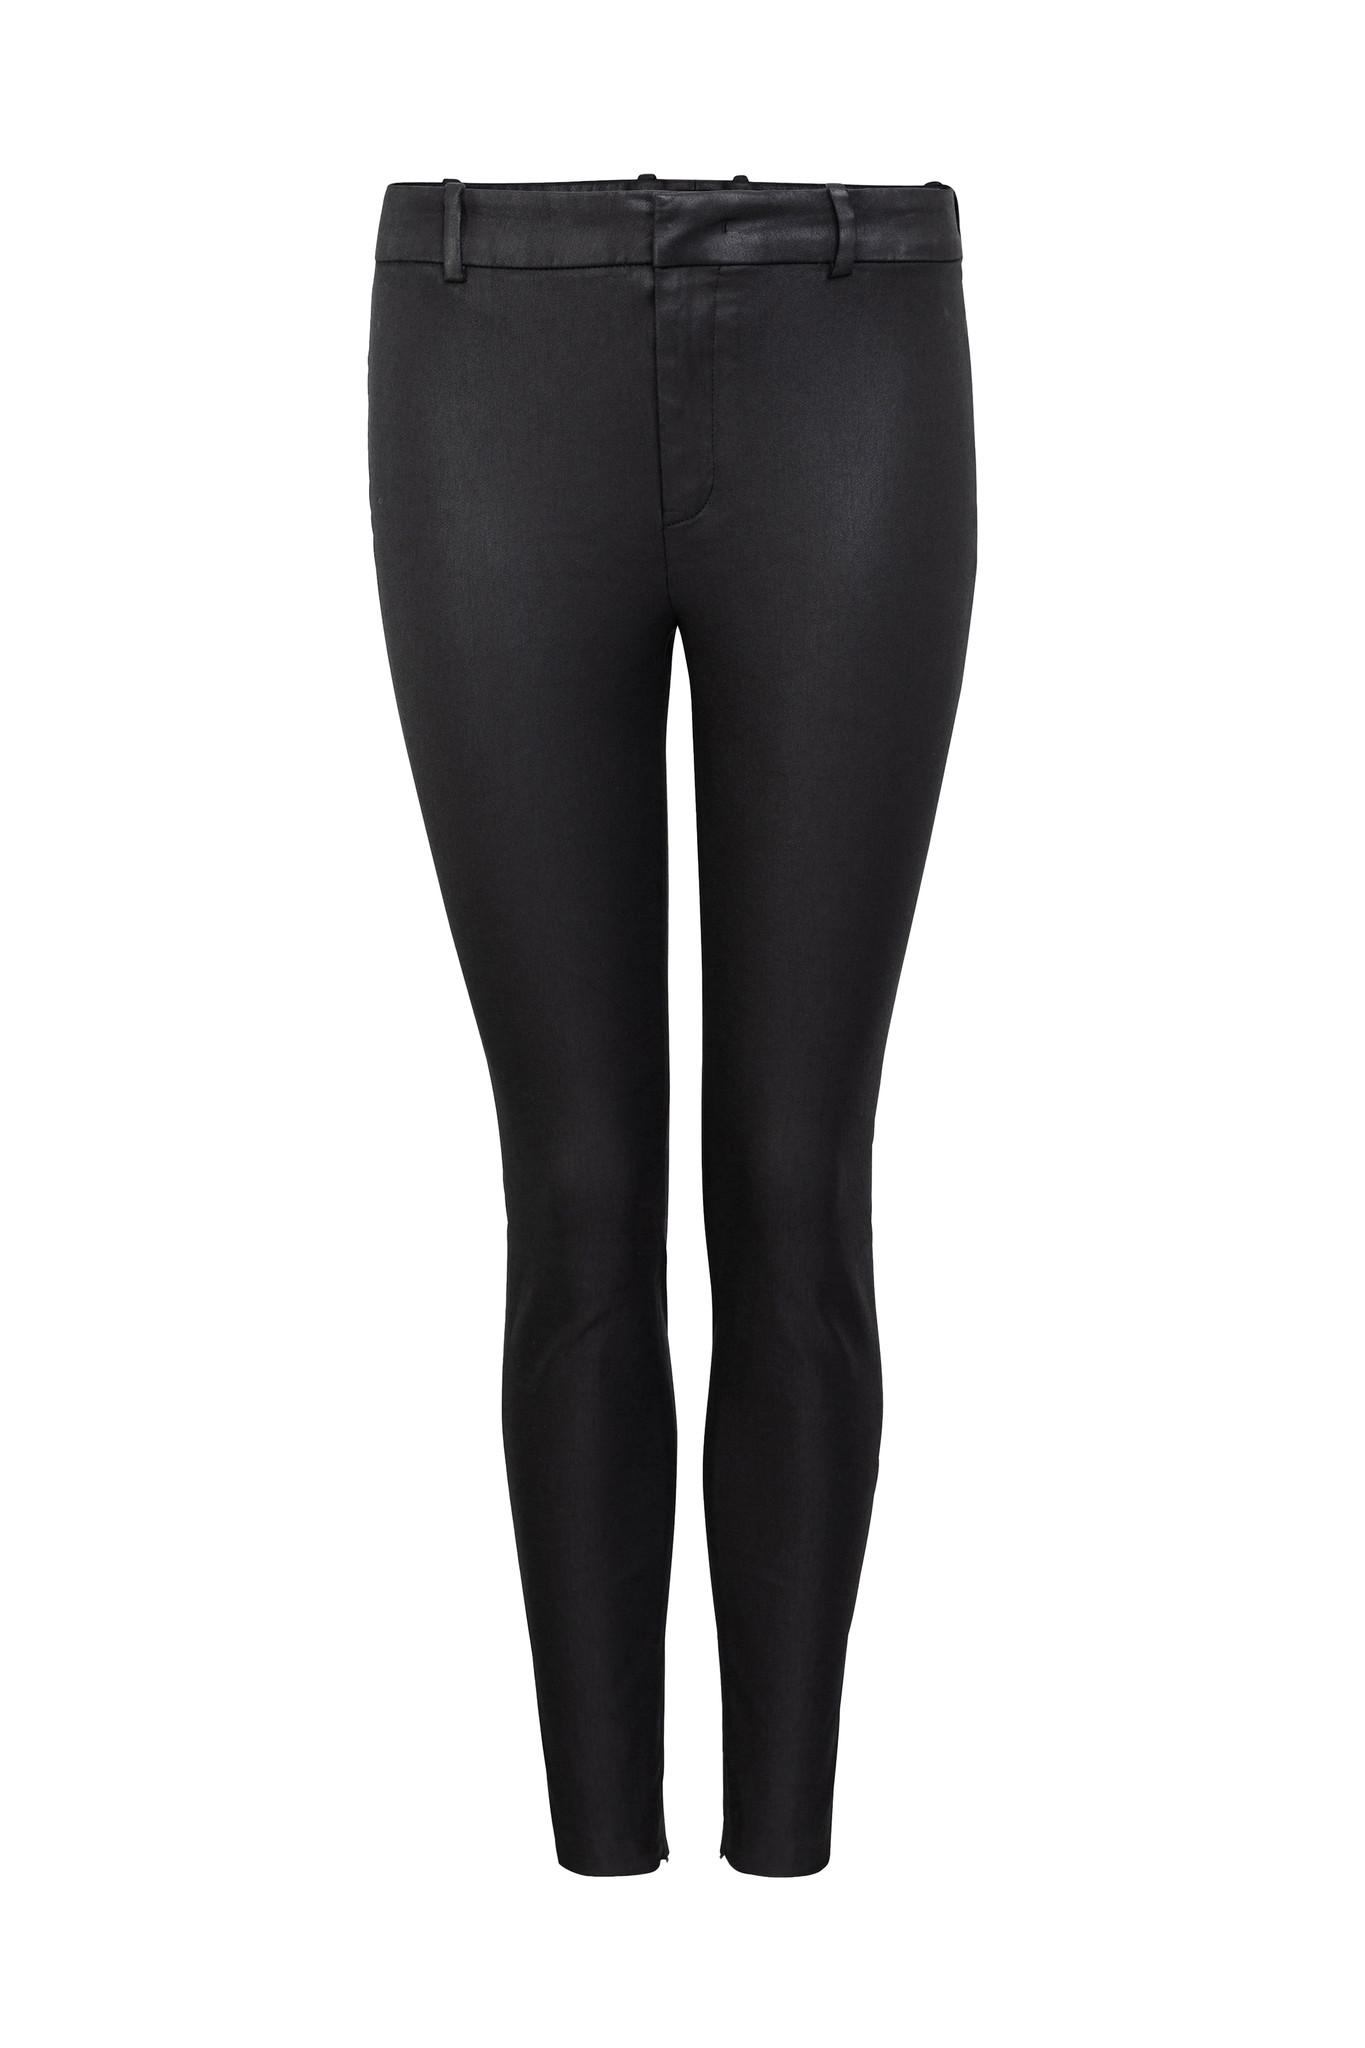 drykorn pants WINCH 156012-1